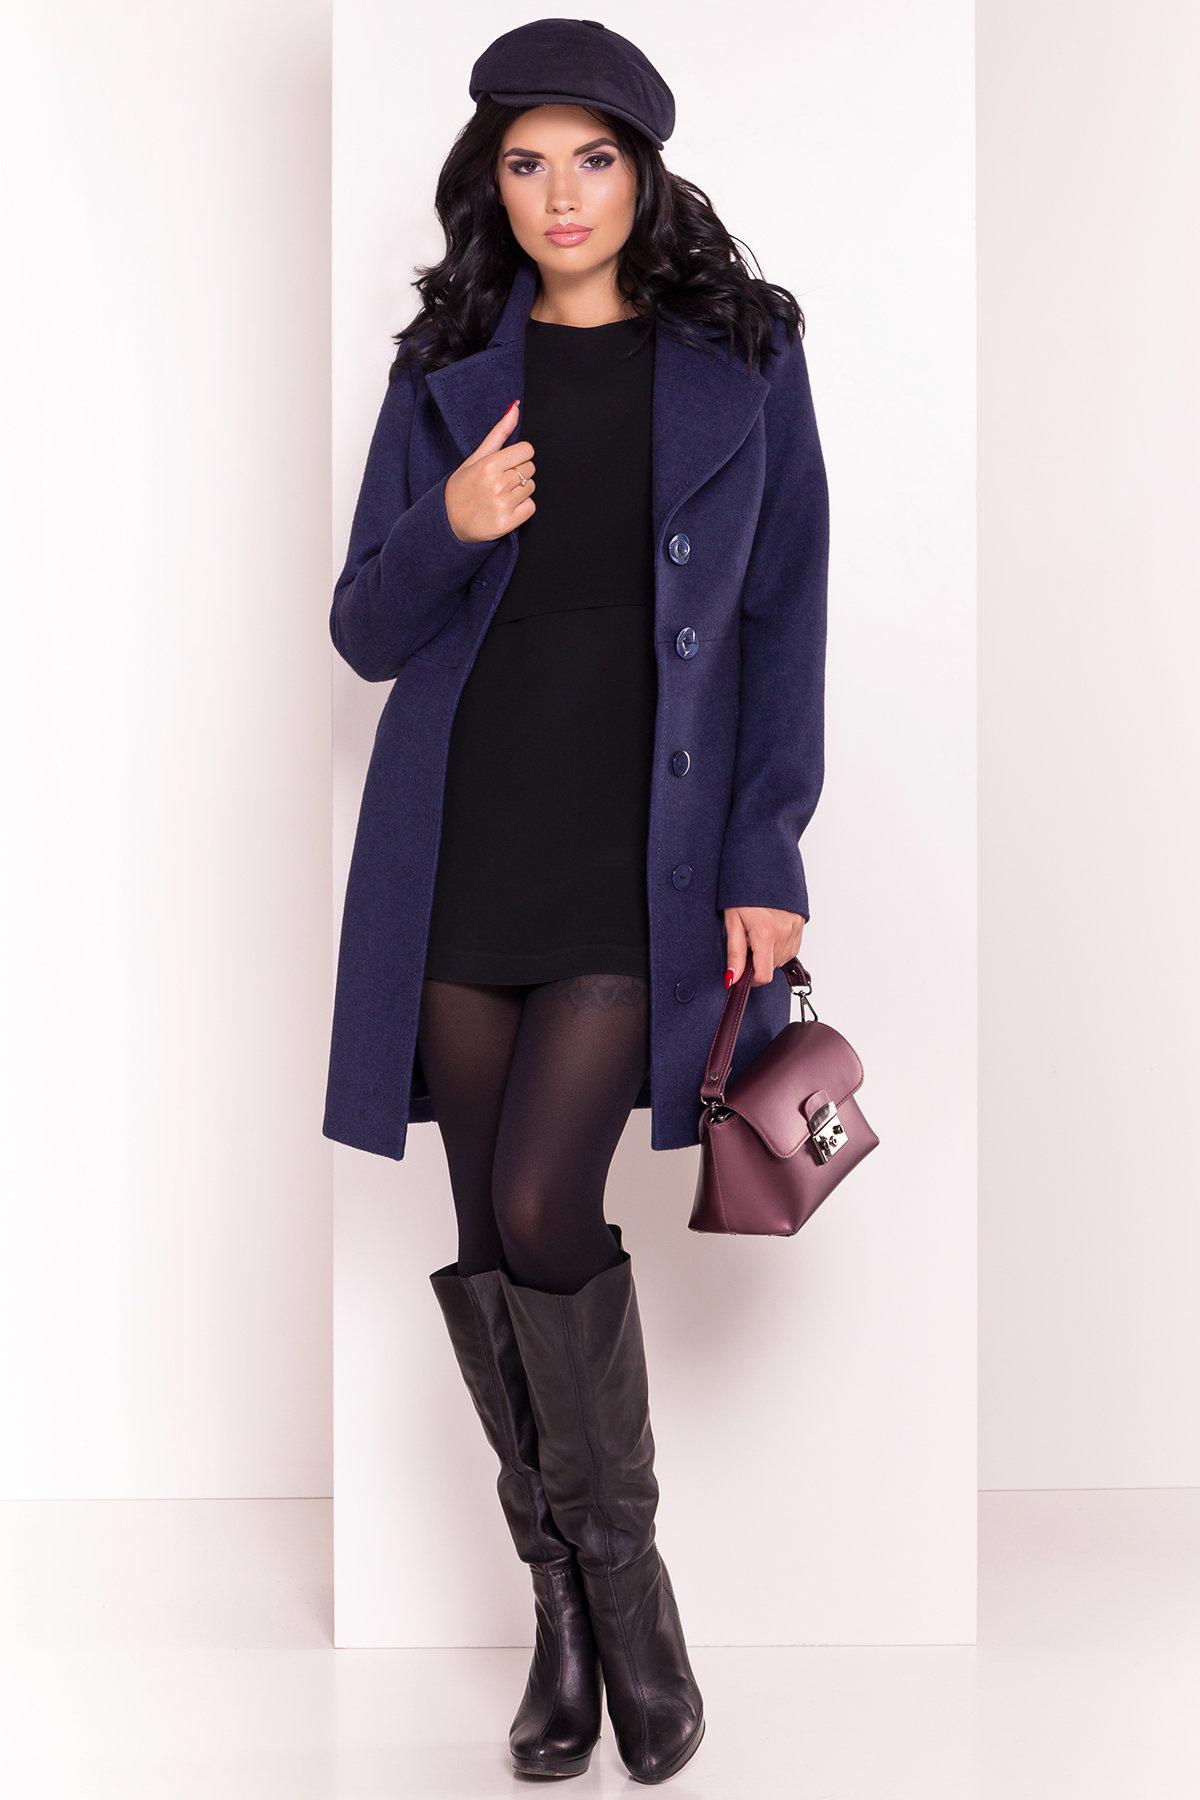 Пальто Камила 5373 АРТ. 36549 Цвет: Темно-синий 17 - фото 1, интернет магазин tm-modus.ru